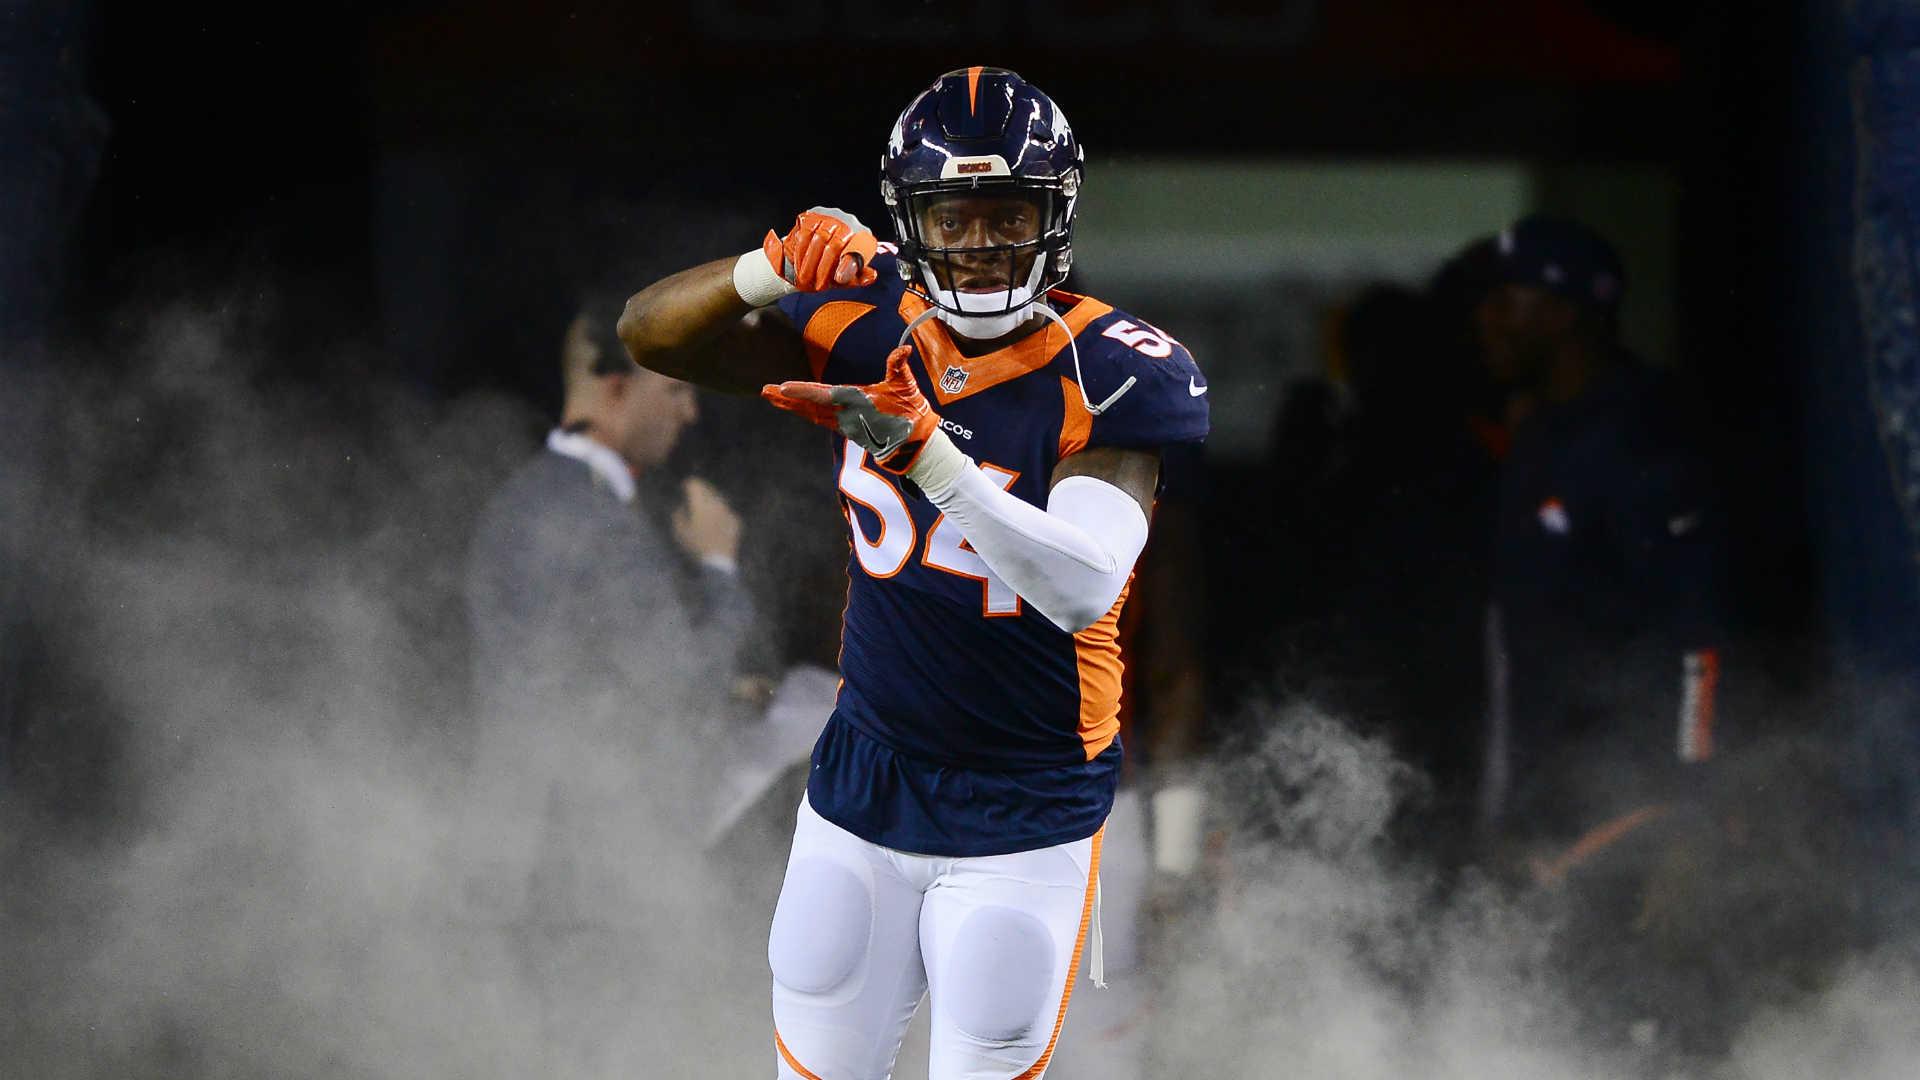 Broncos won't exercise LB Brandon Marshall's option, reports say